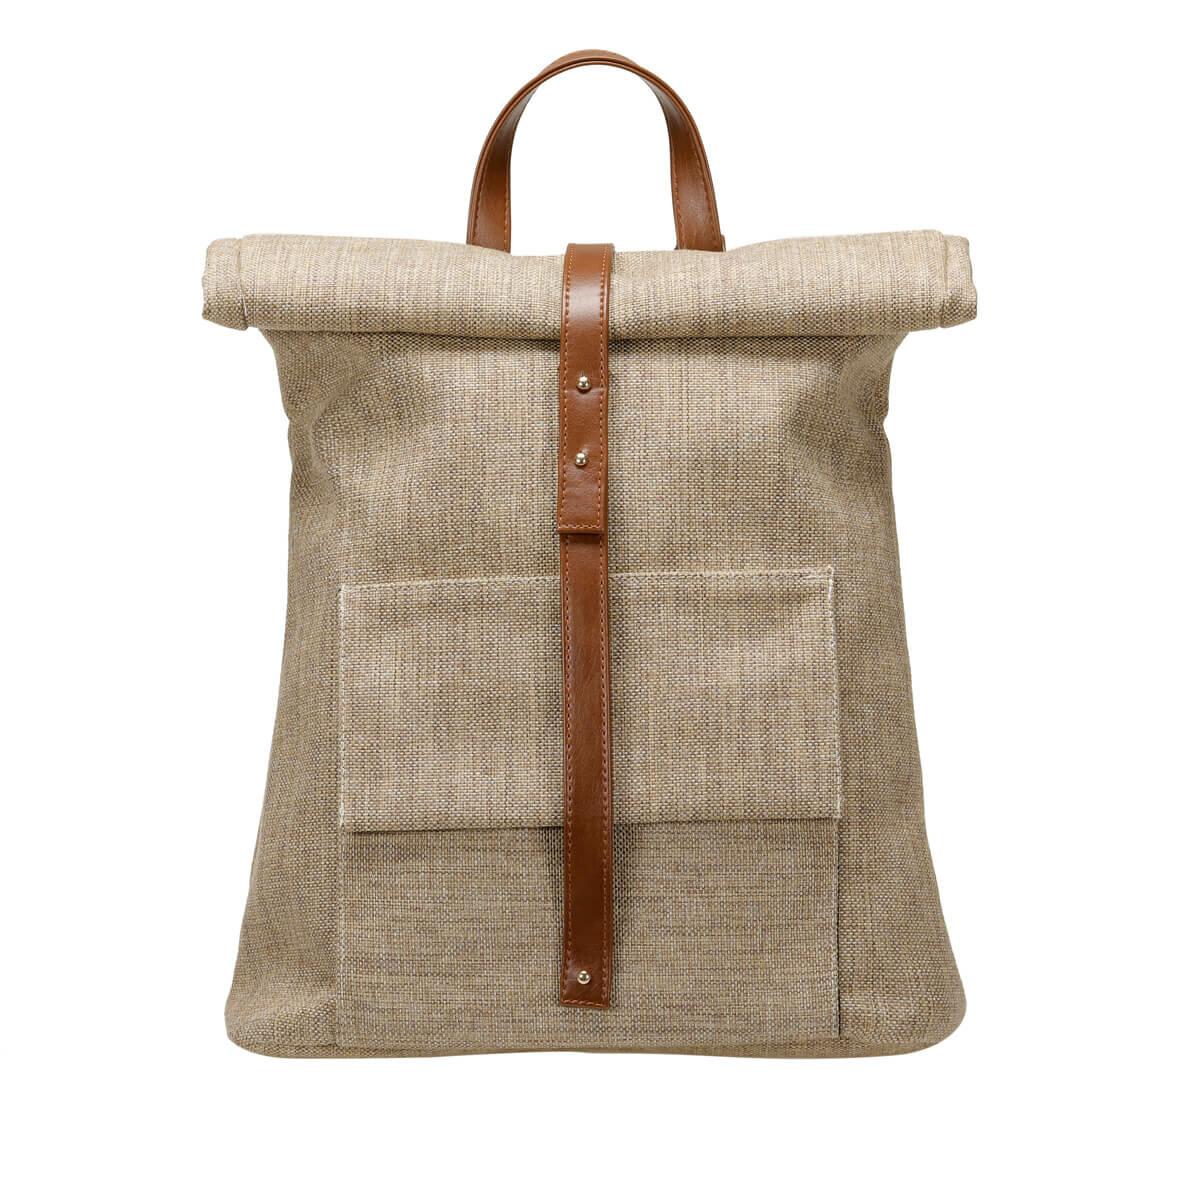 FLO MLS7 TAN BACKPACK Tan Women 'S Backpack BUTIGO